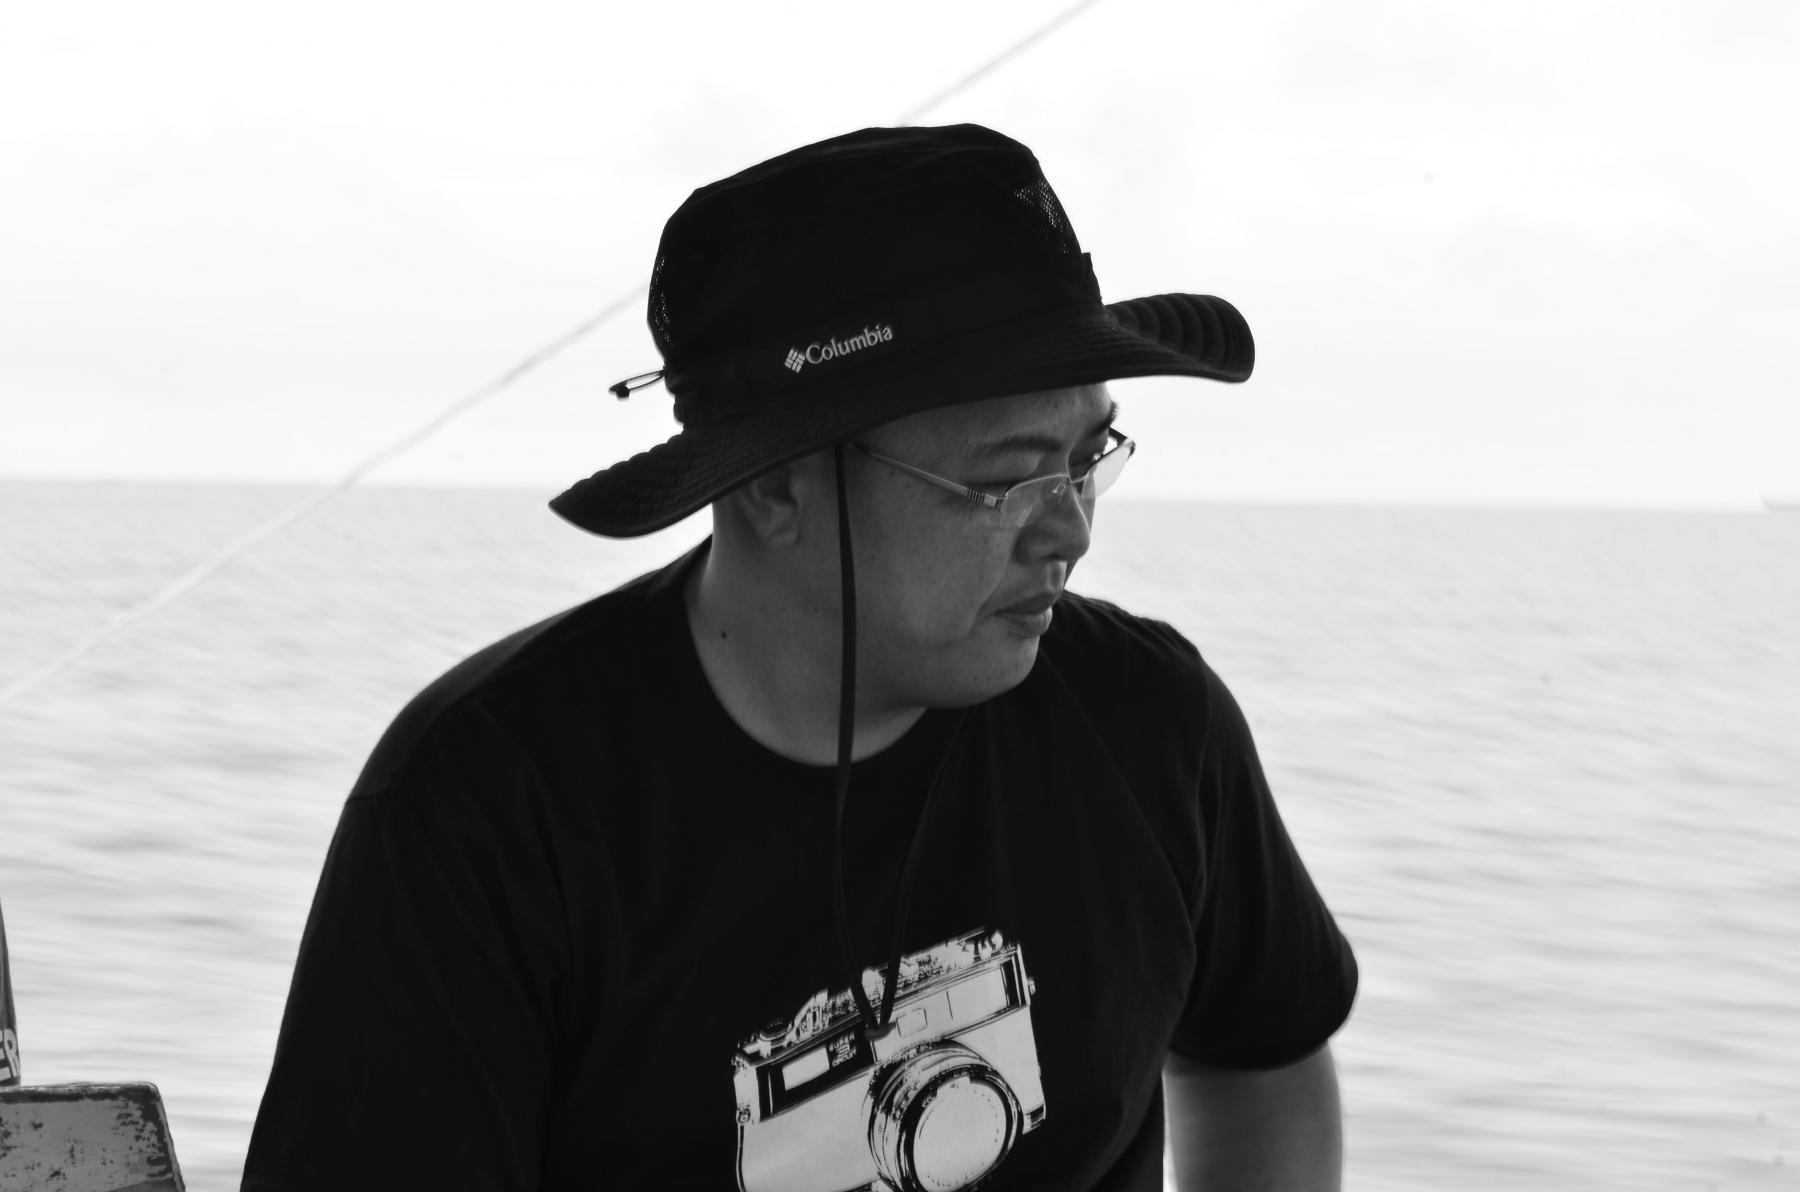 Cebu_21072011_0091